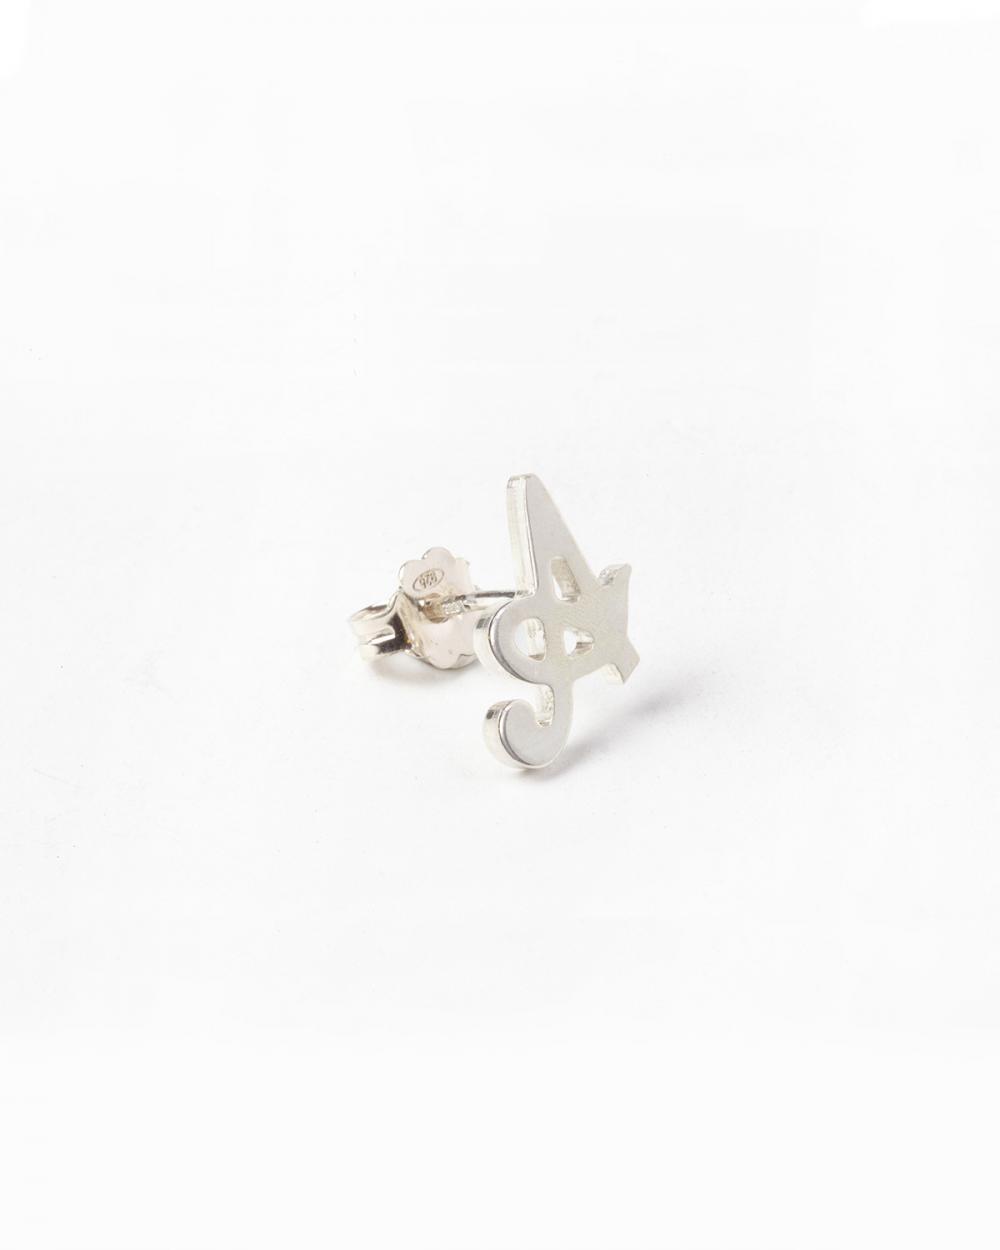 Earrings SMALL ITALICS LETTER SINGLE EARRING NOVE25